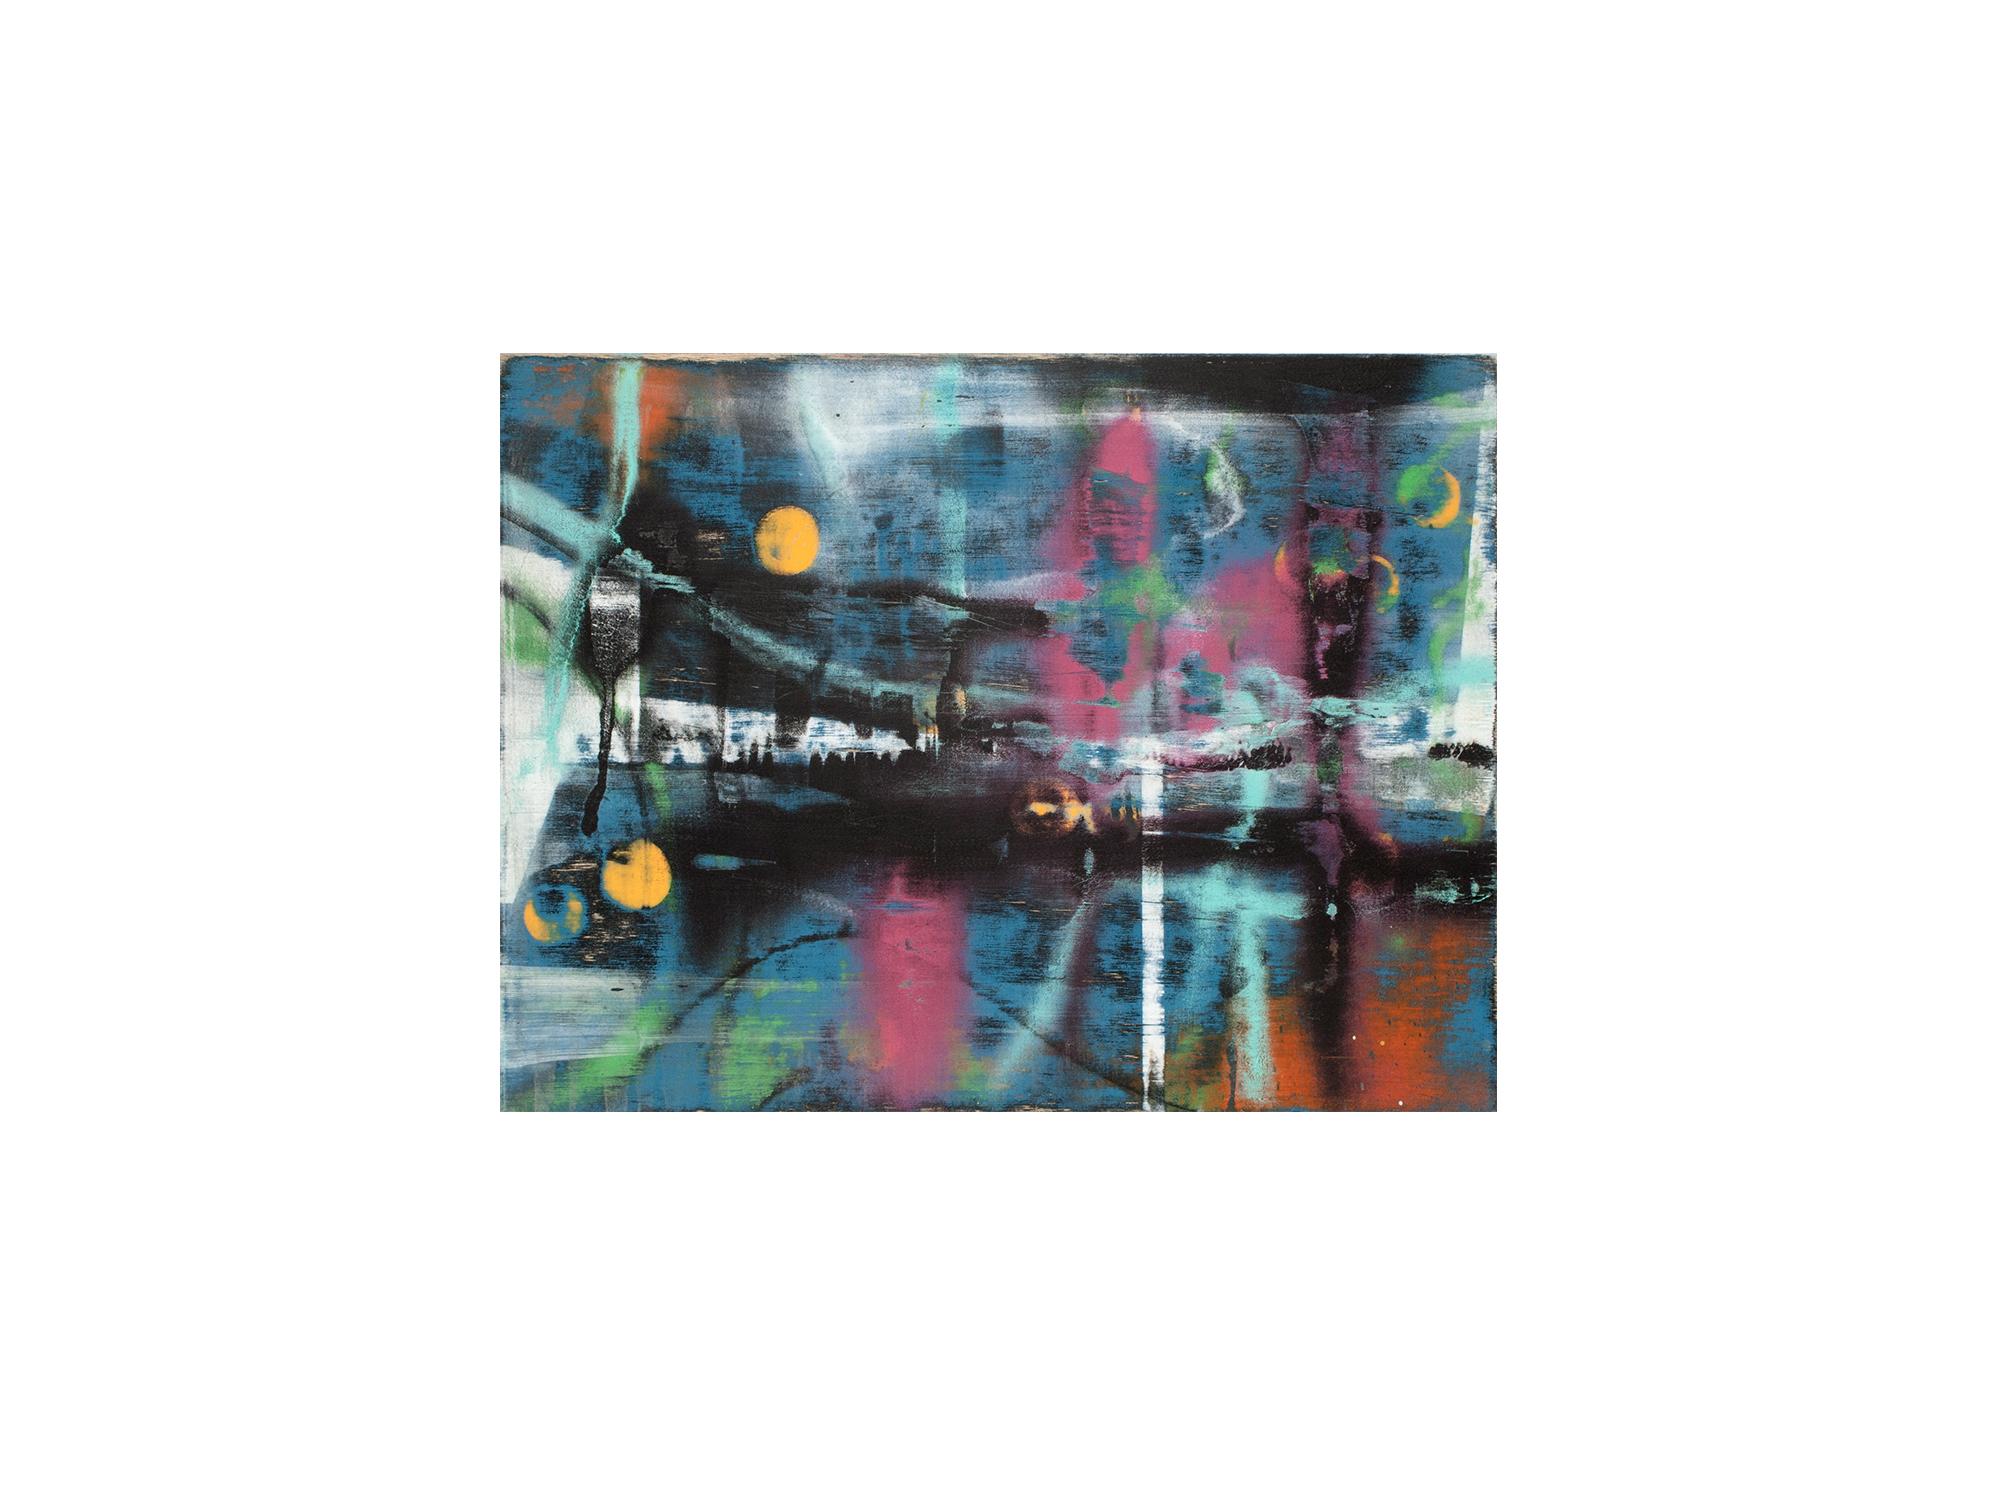 Brett McMahon   KL City 4 , 2017 acrylic and enamel on ply panel 60 x 80cm   ARTIST BIO